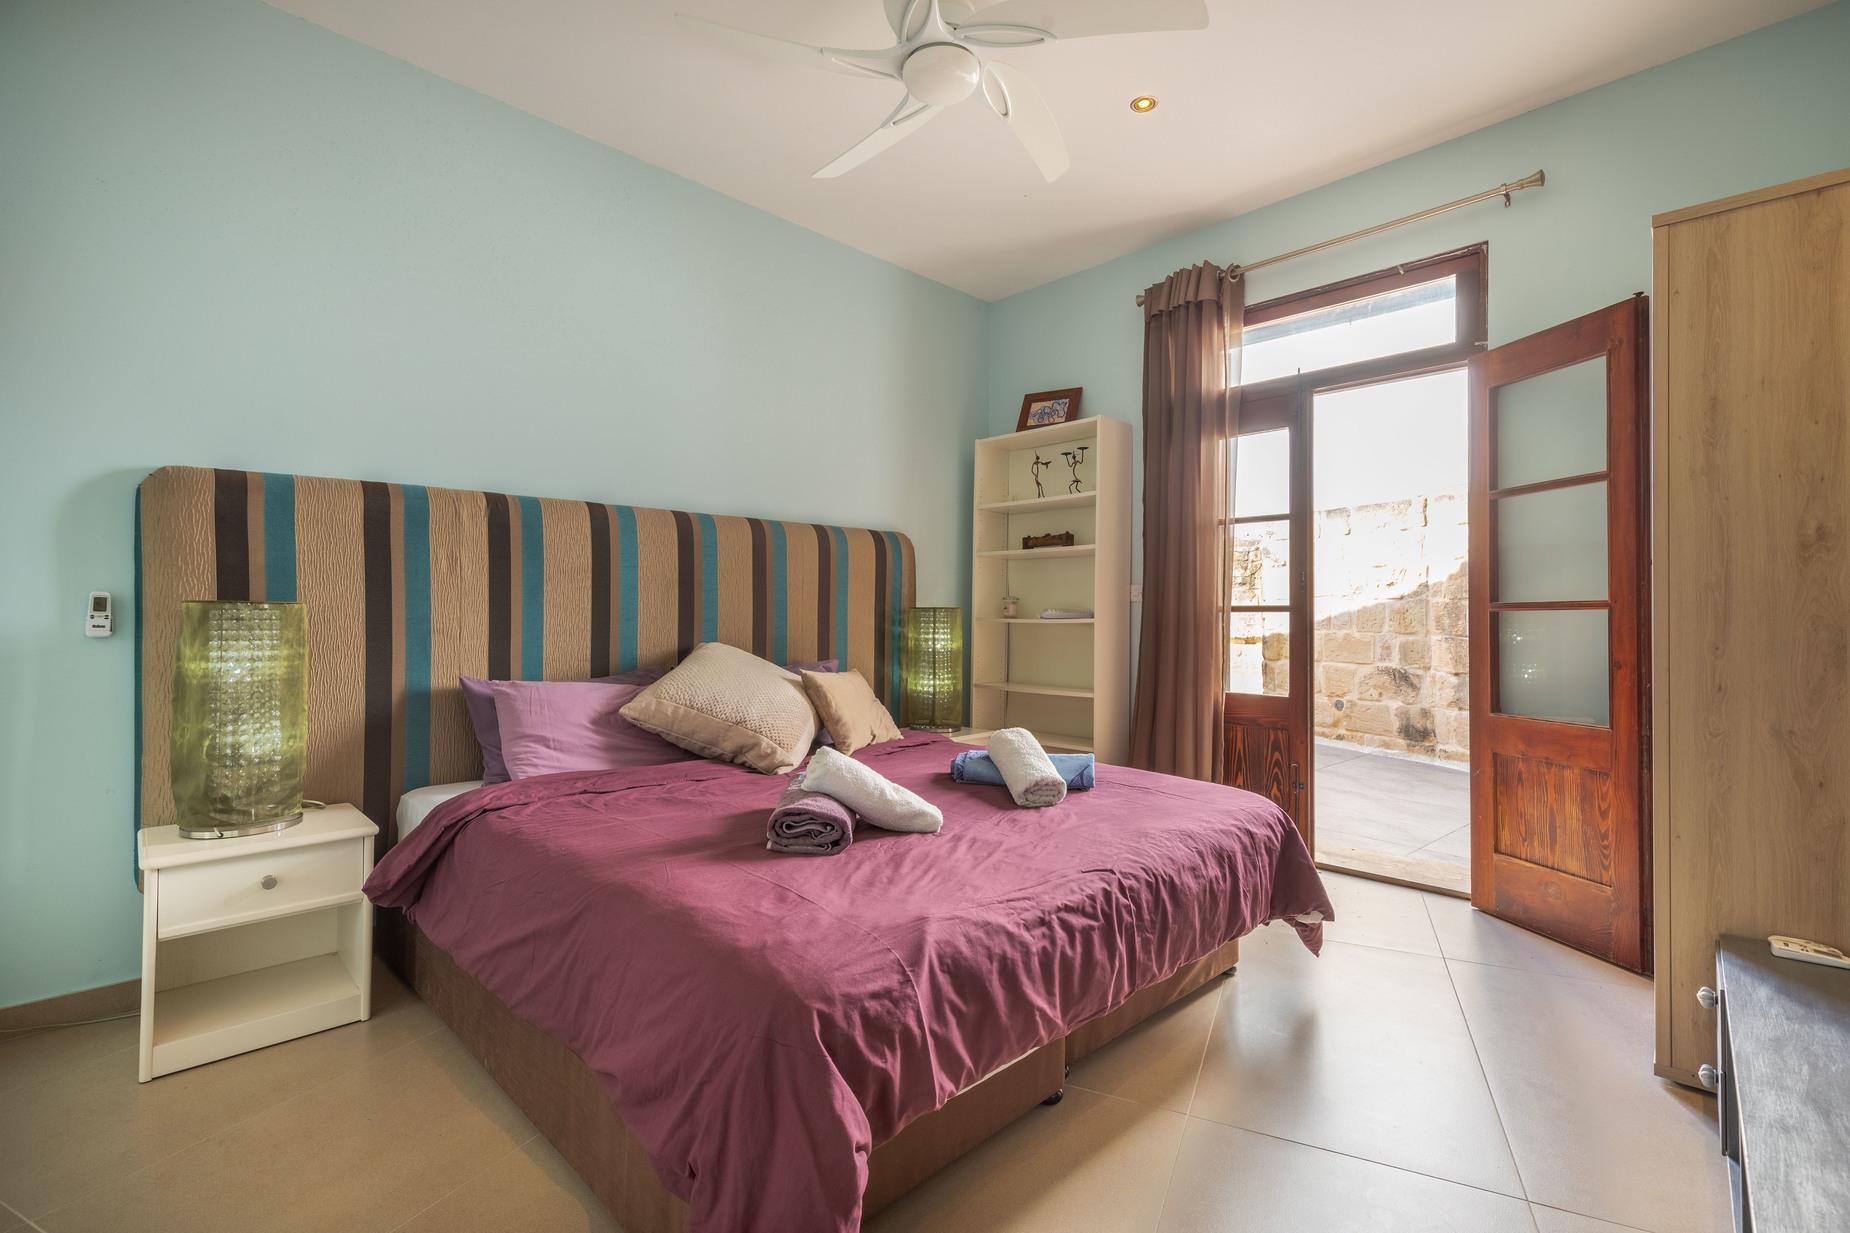 5 bed Villa For Sale in Zebbug, Zebbug - thumb 11